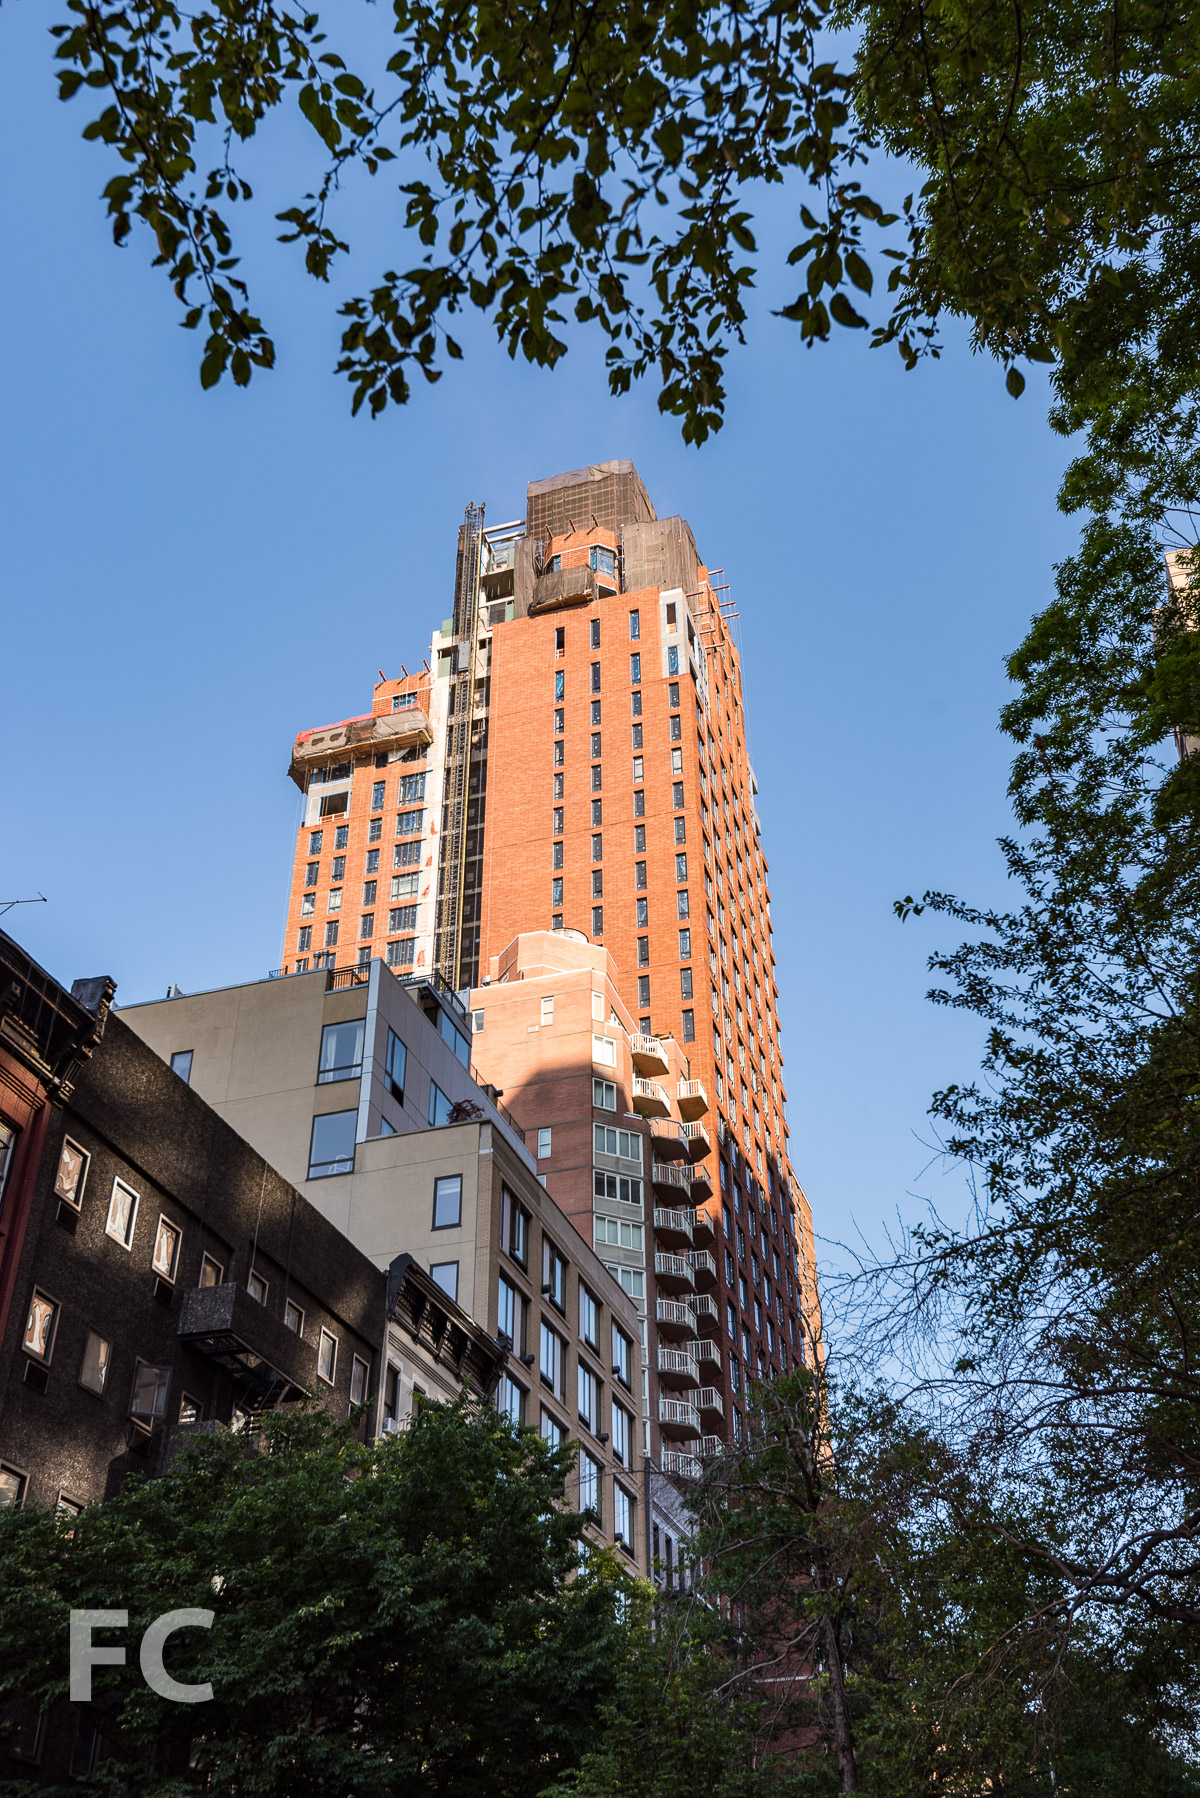 East façade from East 95th Street.